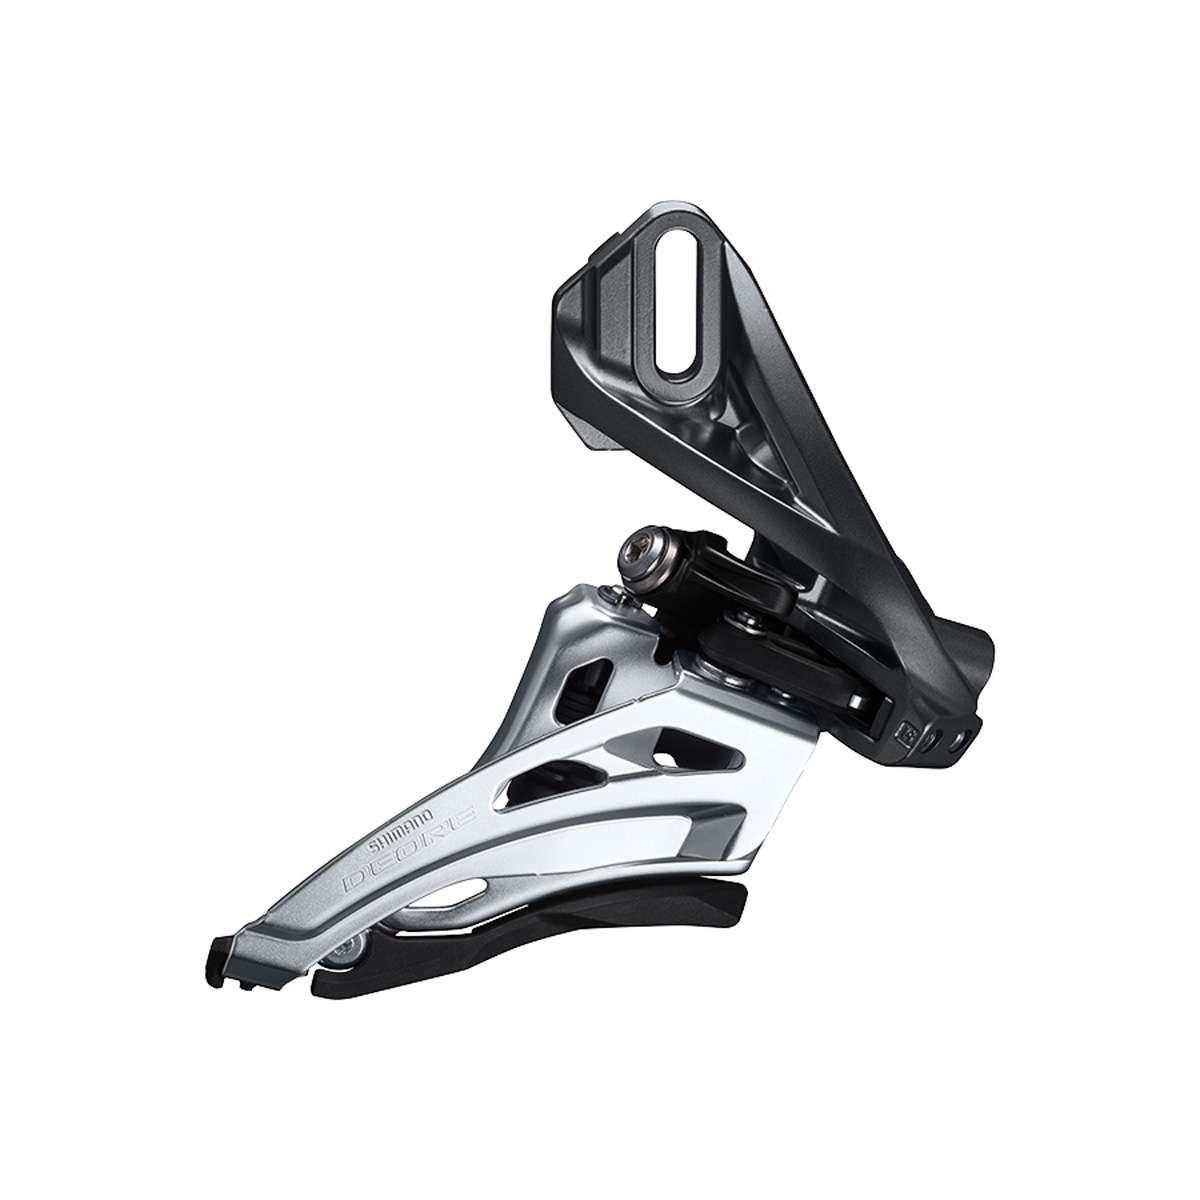 Shimano Deore m6000マウンテン自転車フロントDerailleur – fd-m6020-d – ifdm6020d6 B073J1PLSP